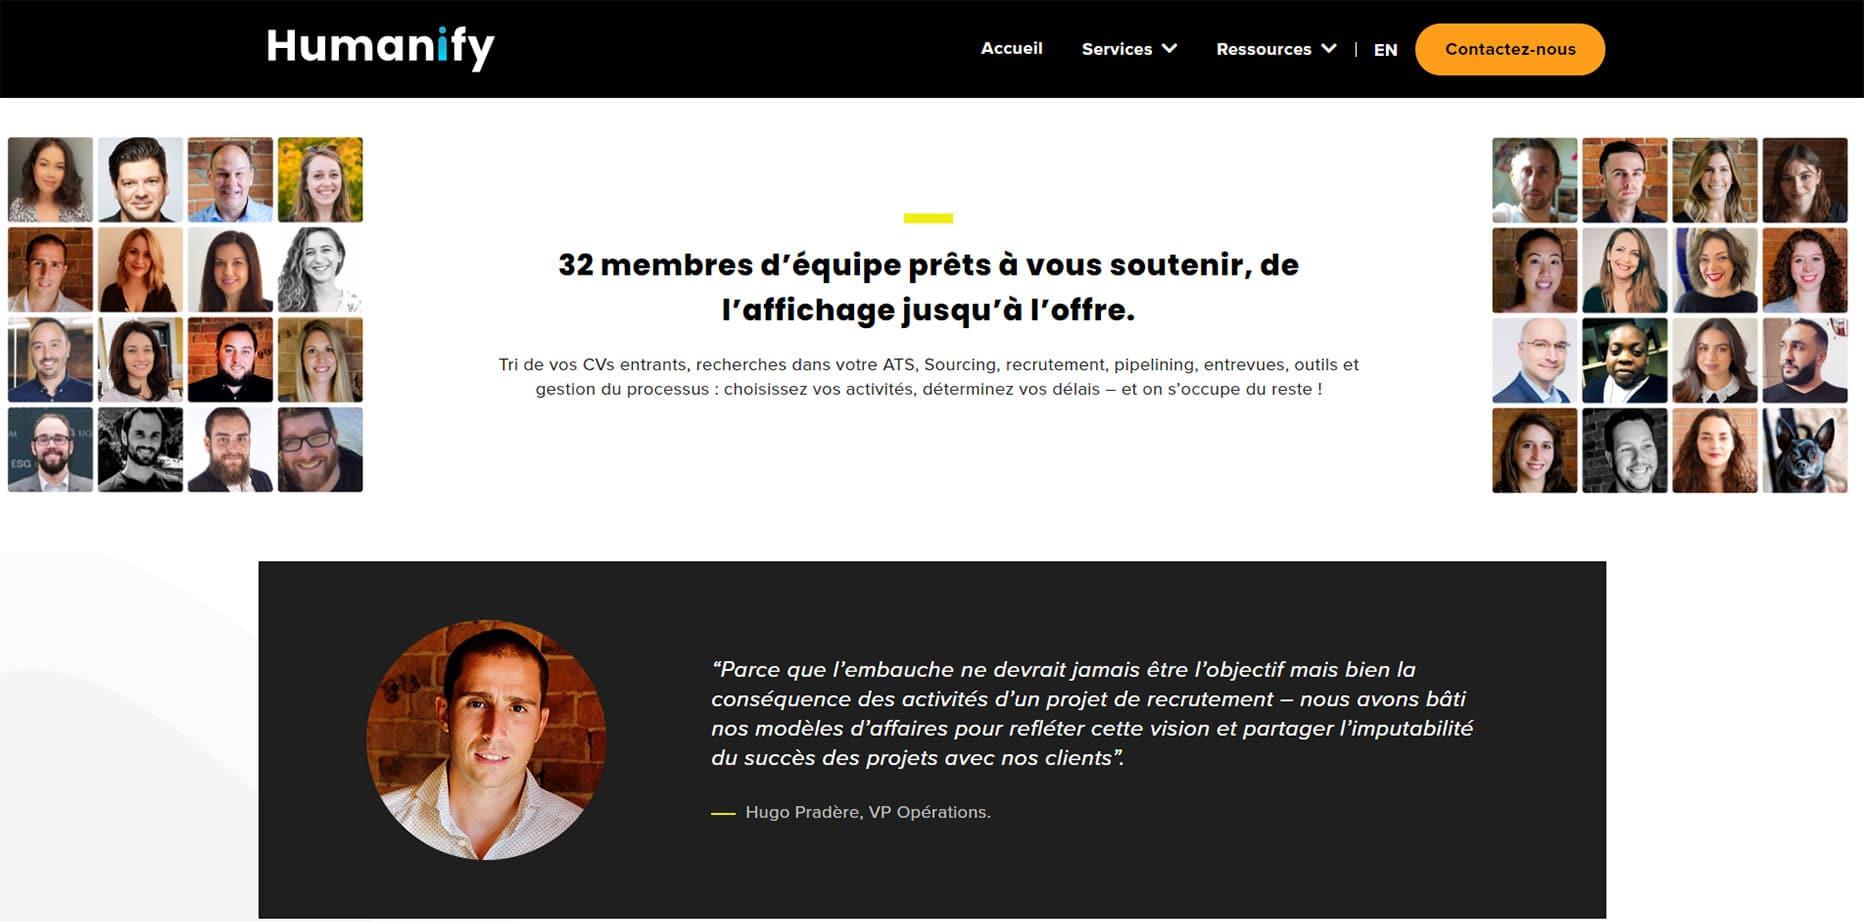 Humanify 360 - 4